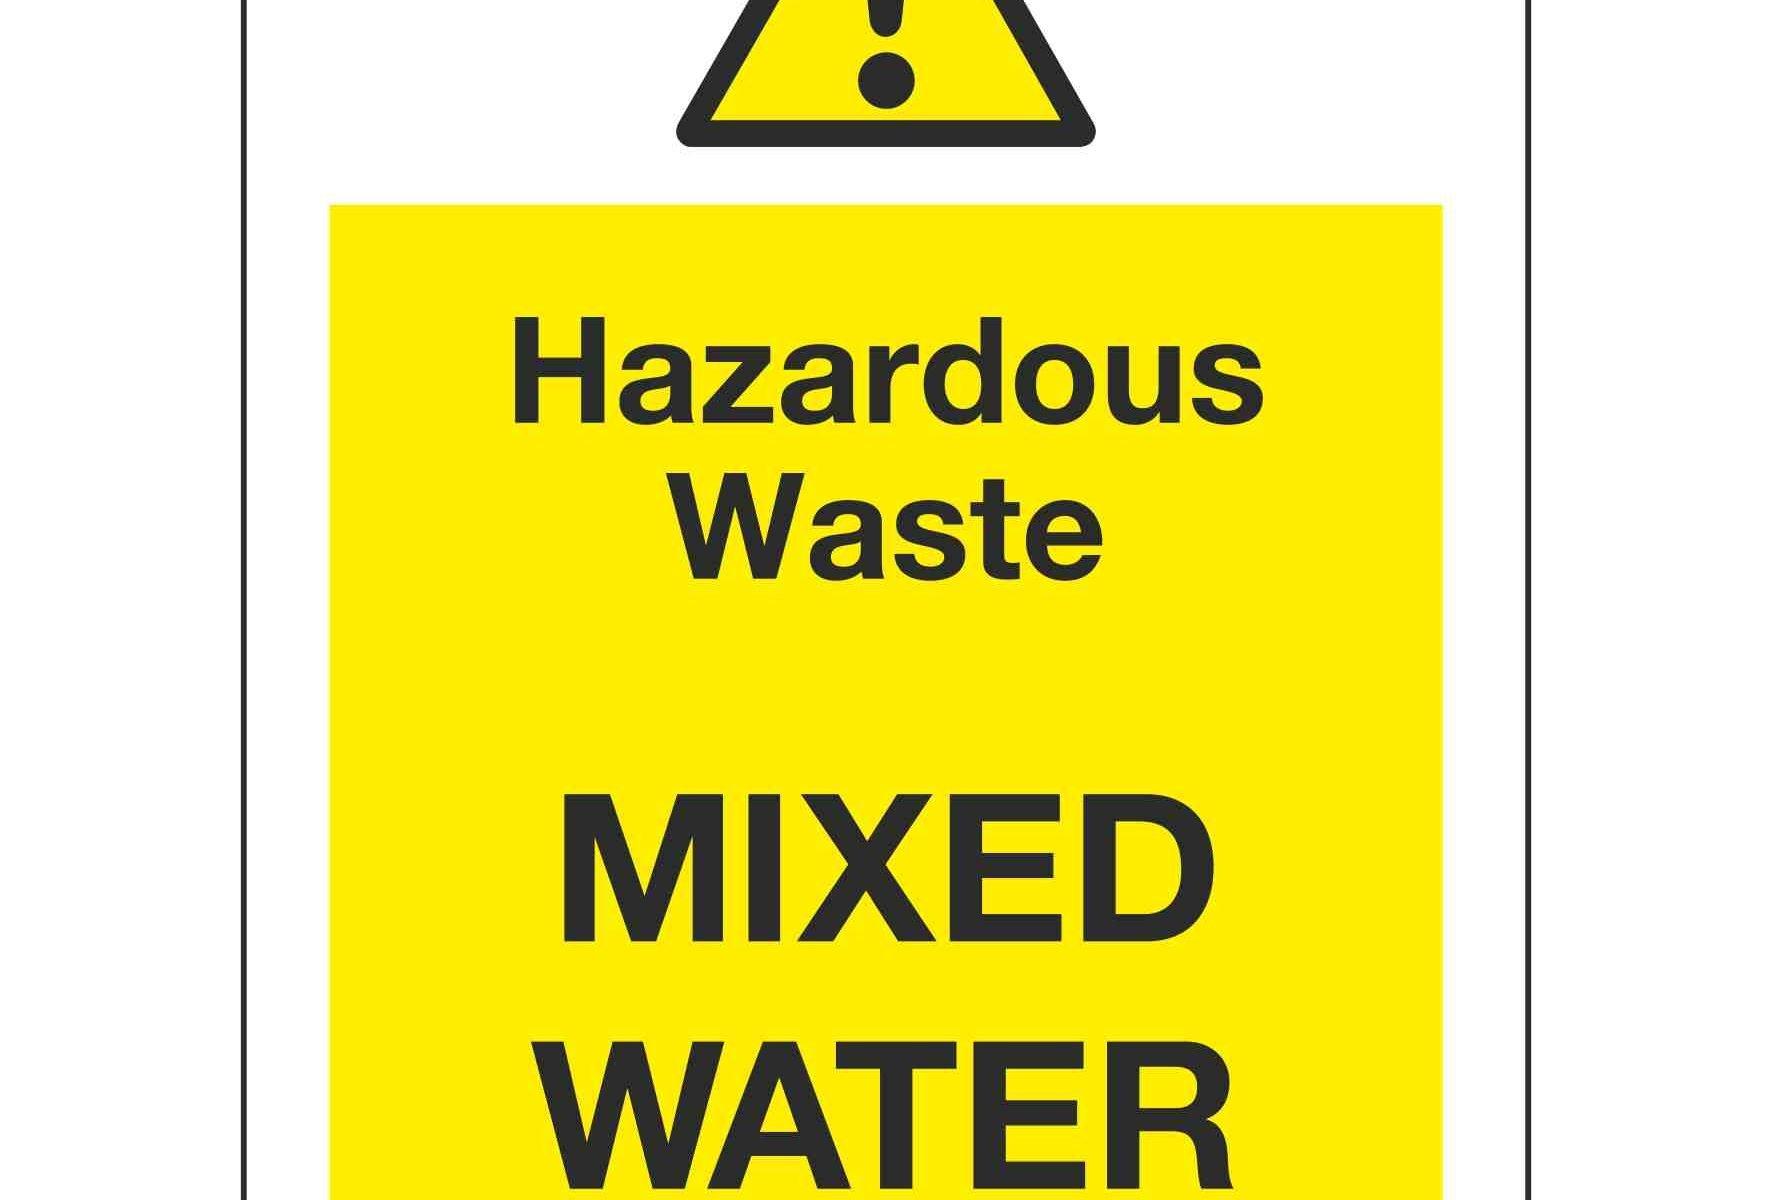 Hazardous Waste MIXED WATER